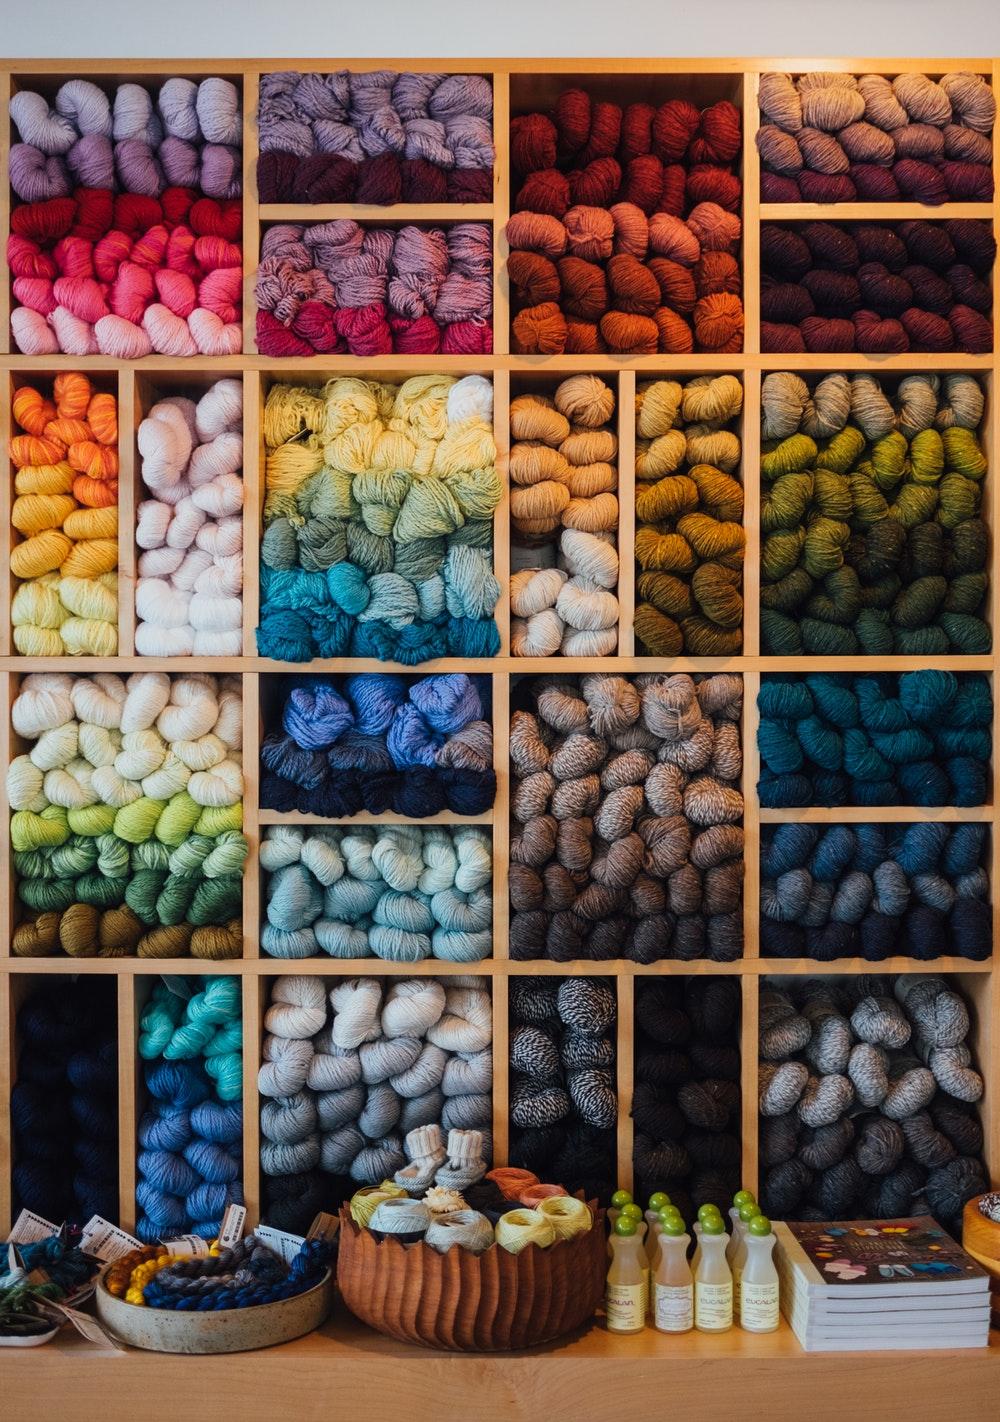 Yarn shop photo from Unsplash.jpg